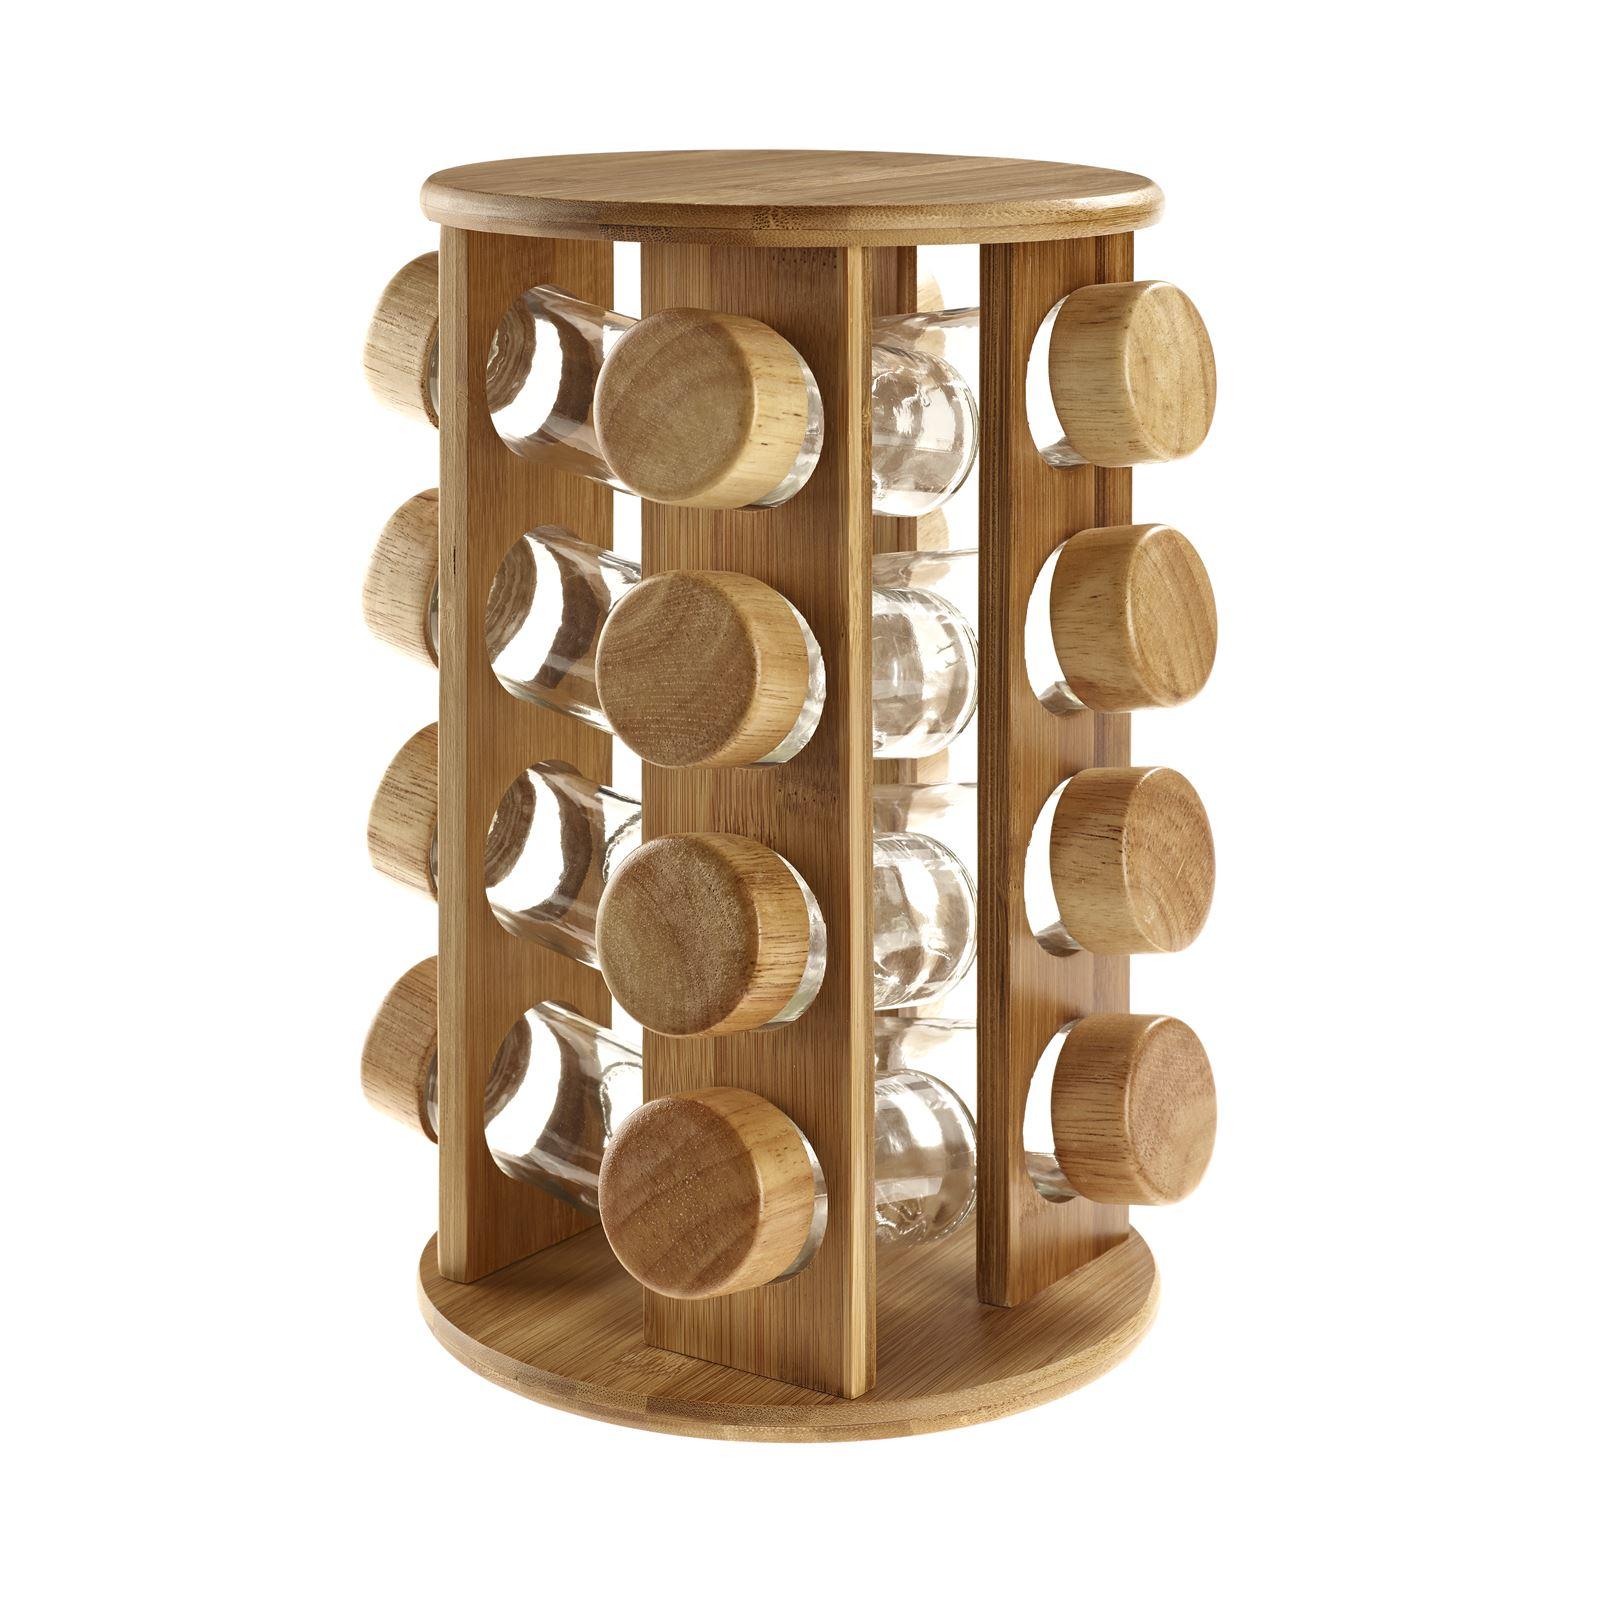 Wooden Rotating Revolving Bamboo Spice Rack Glass Jars